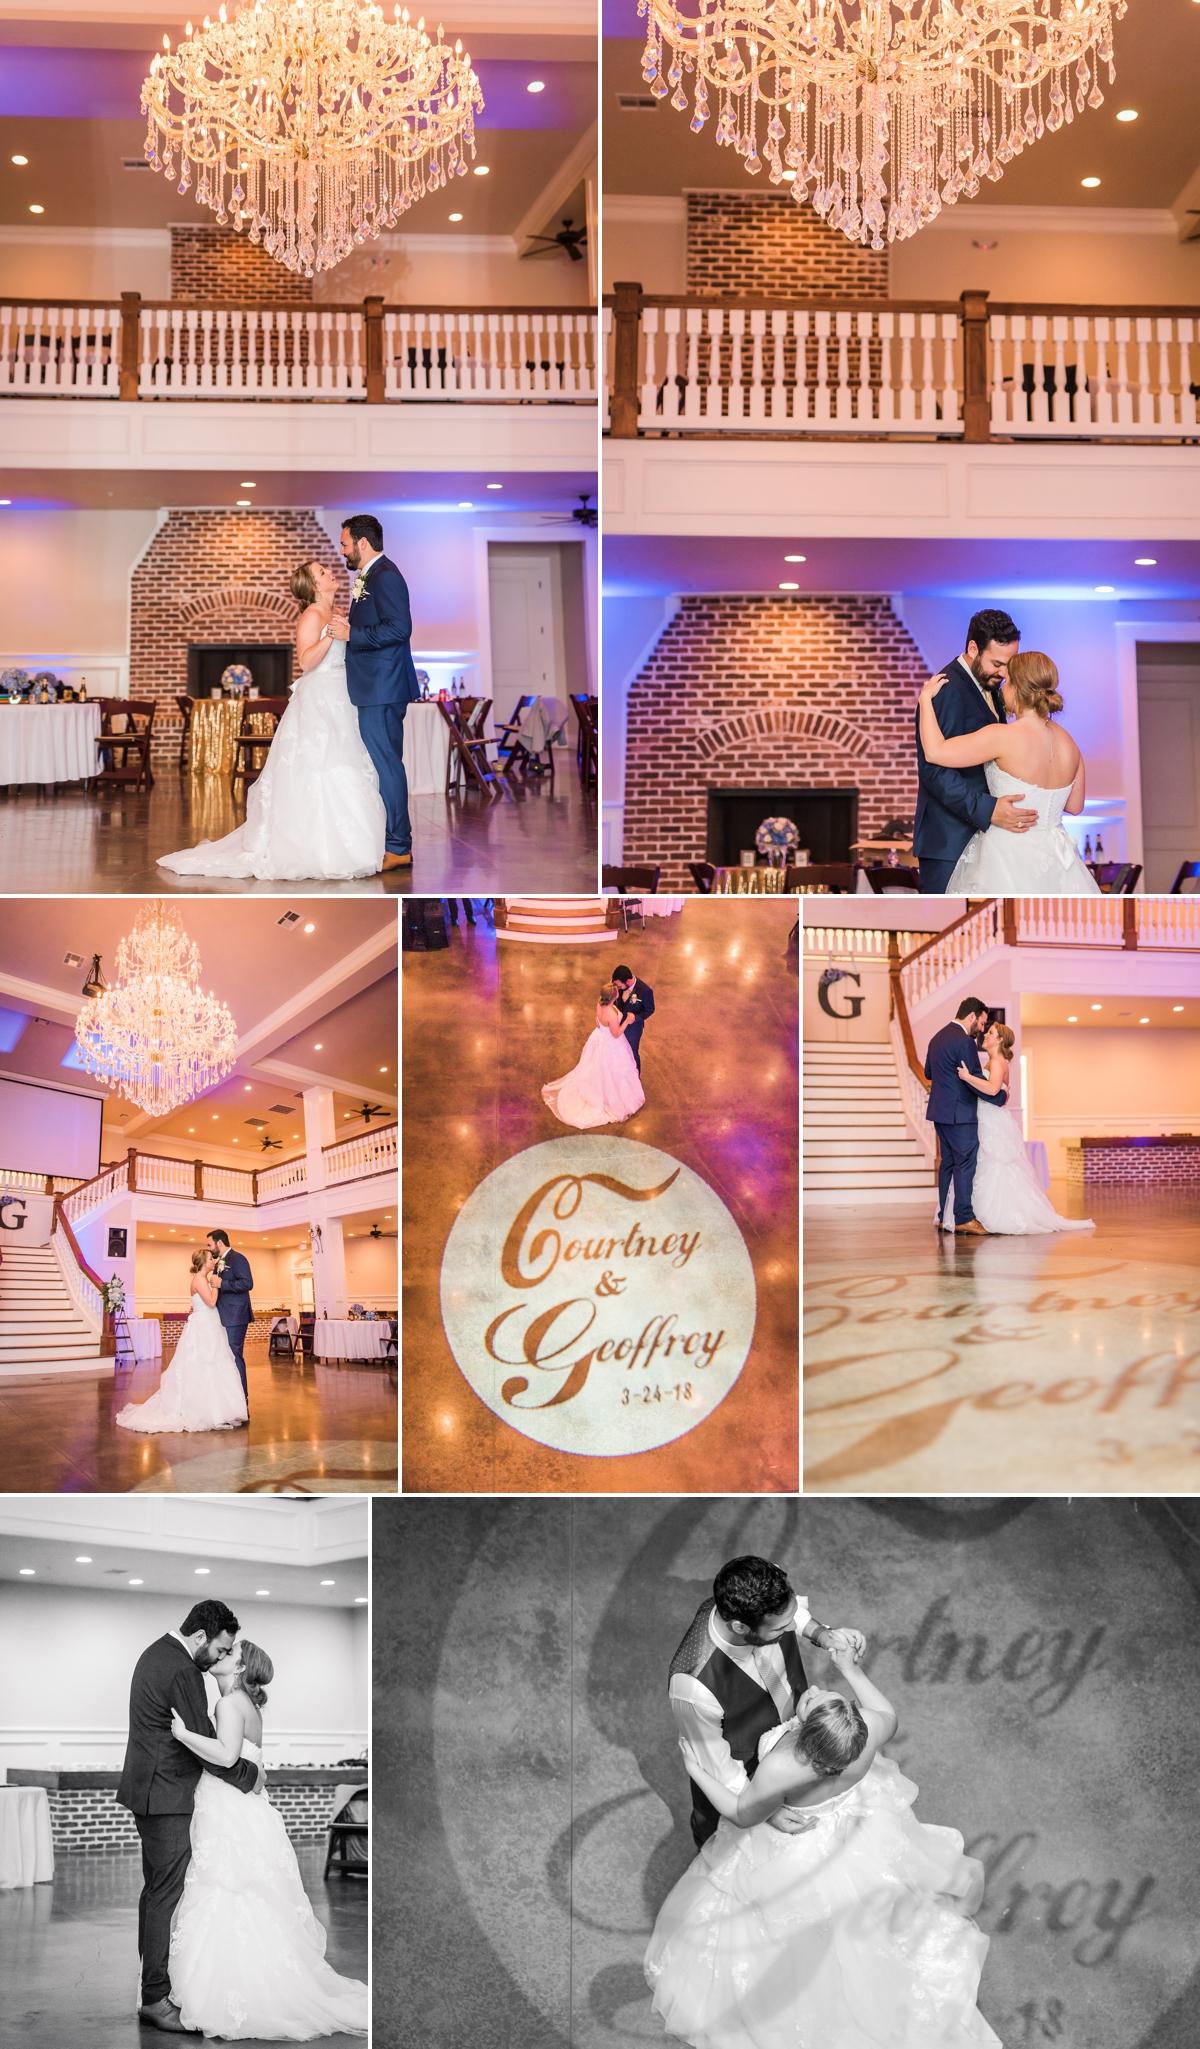 Magnolia Manor Wedding Reception Private Last Dance